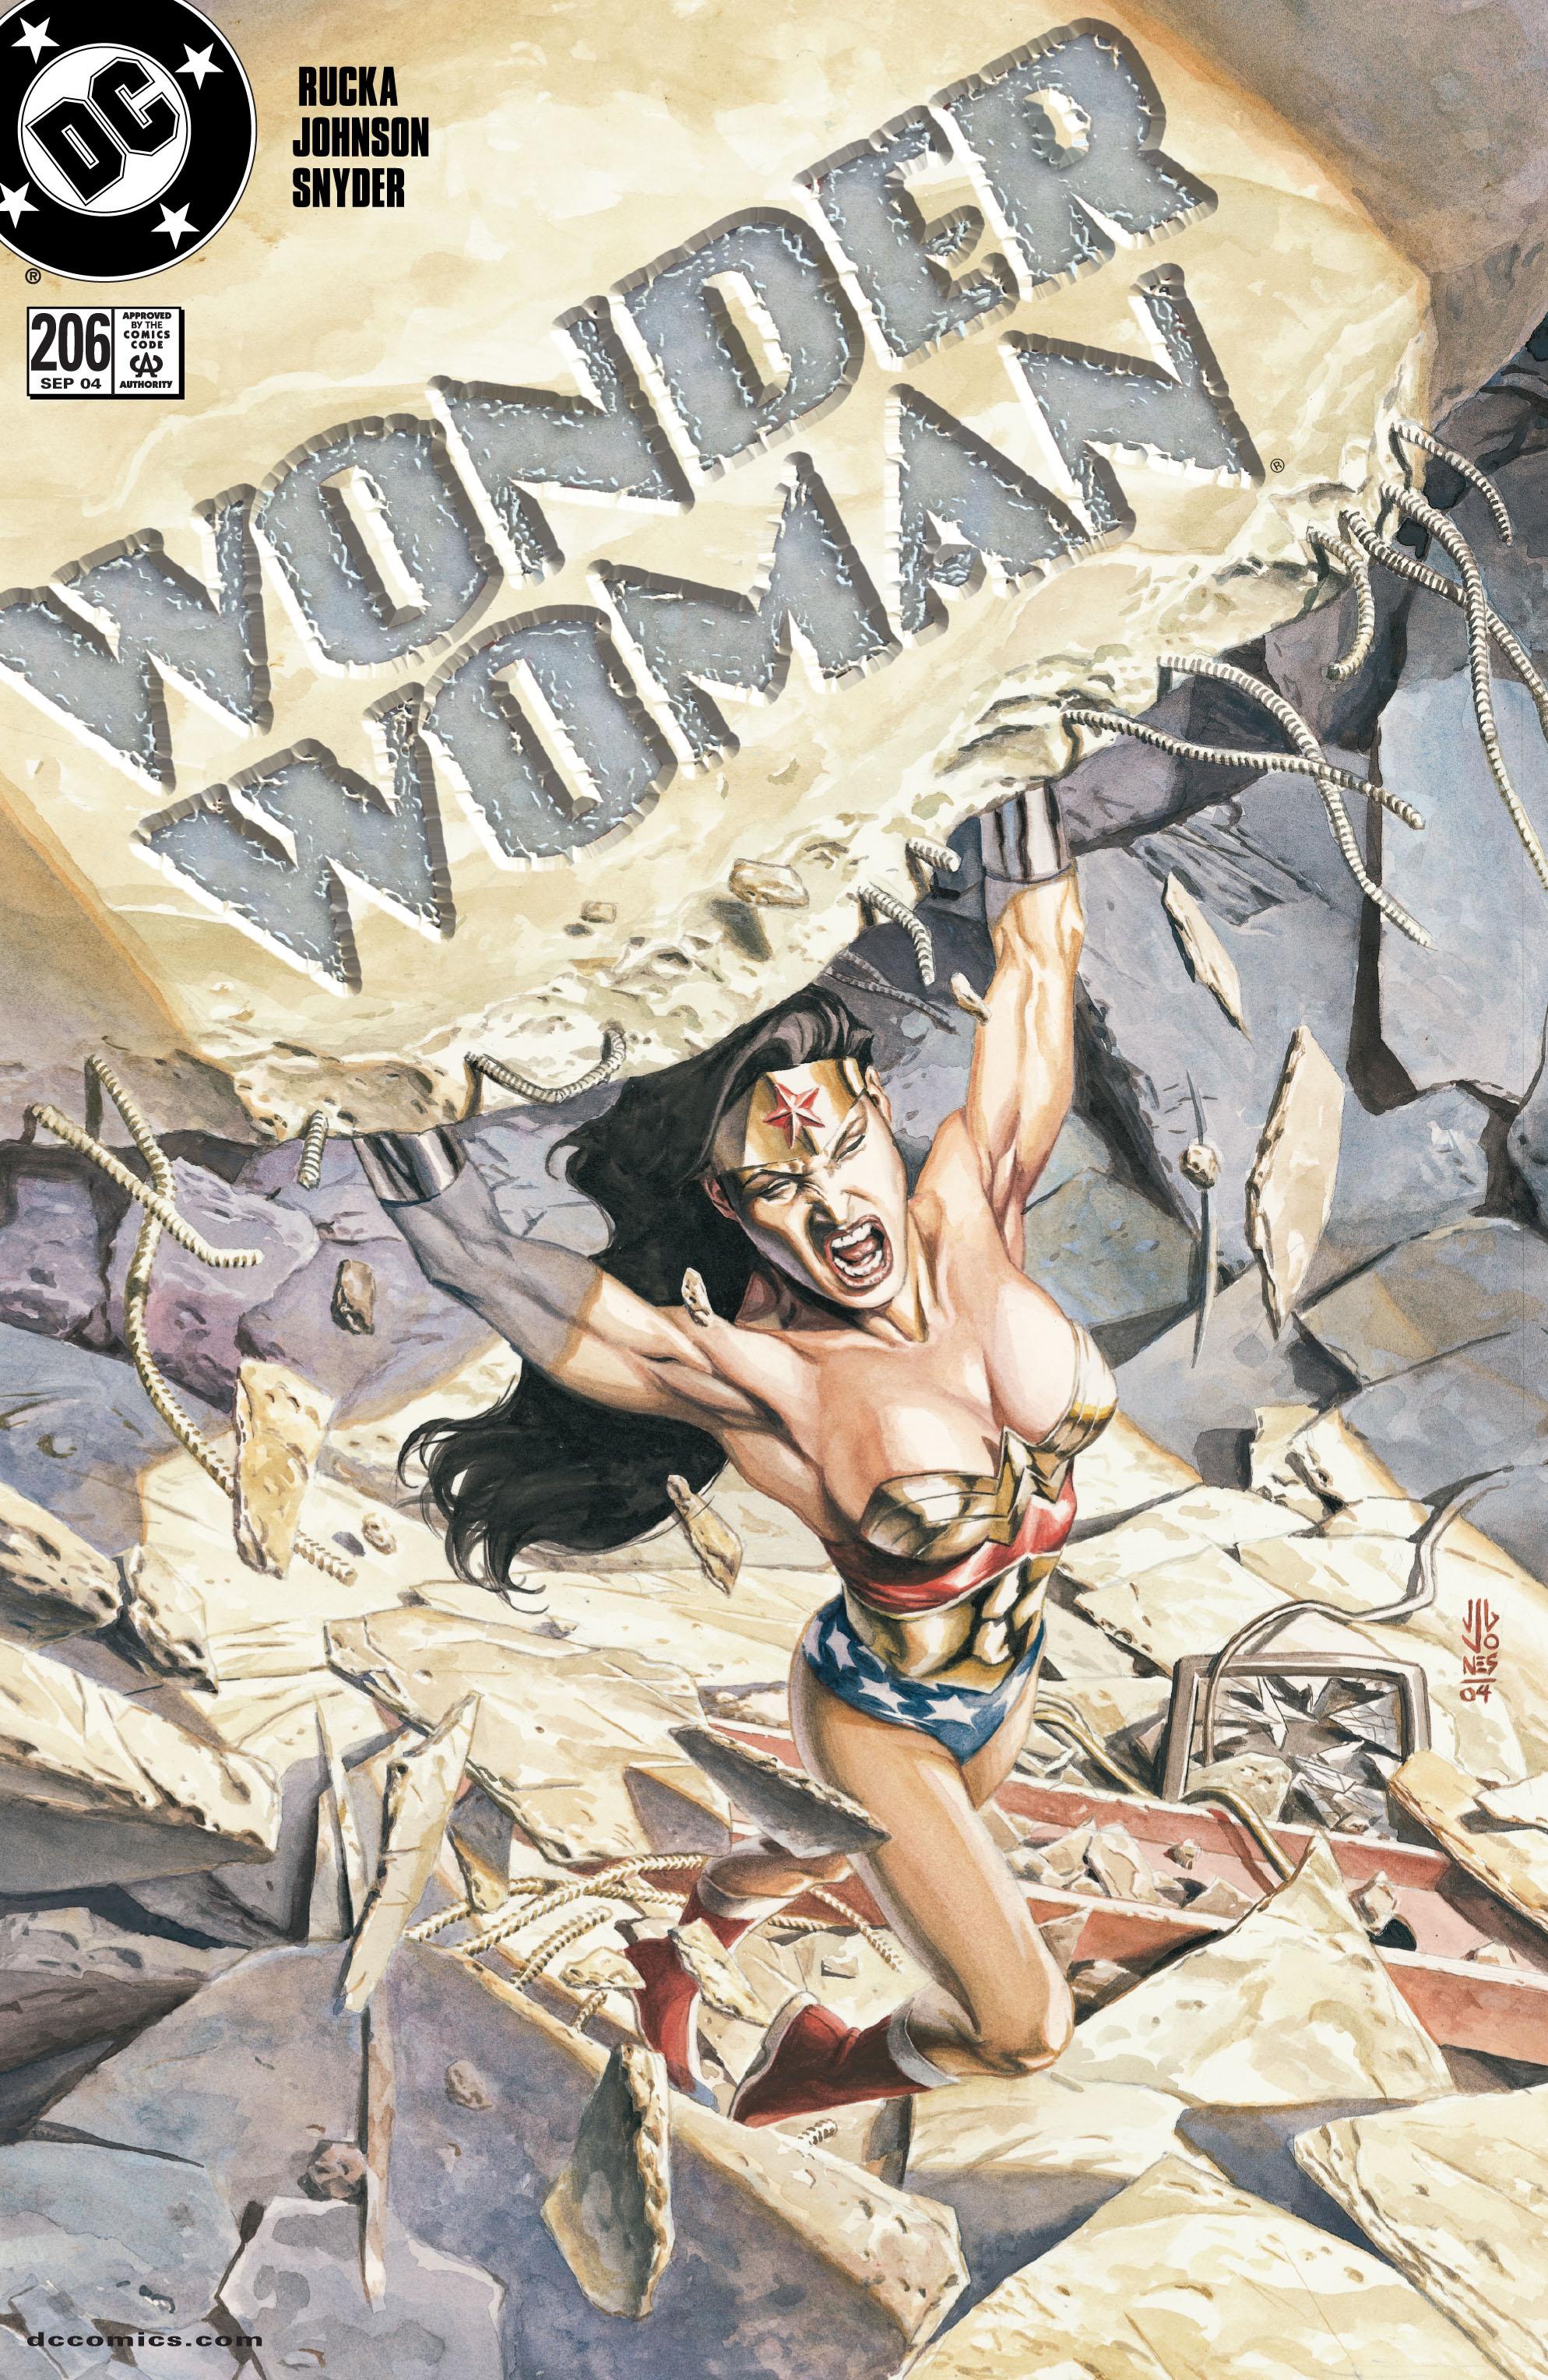 Read online Wonder Woman (1987) comic -  Issue #206 - 1